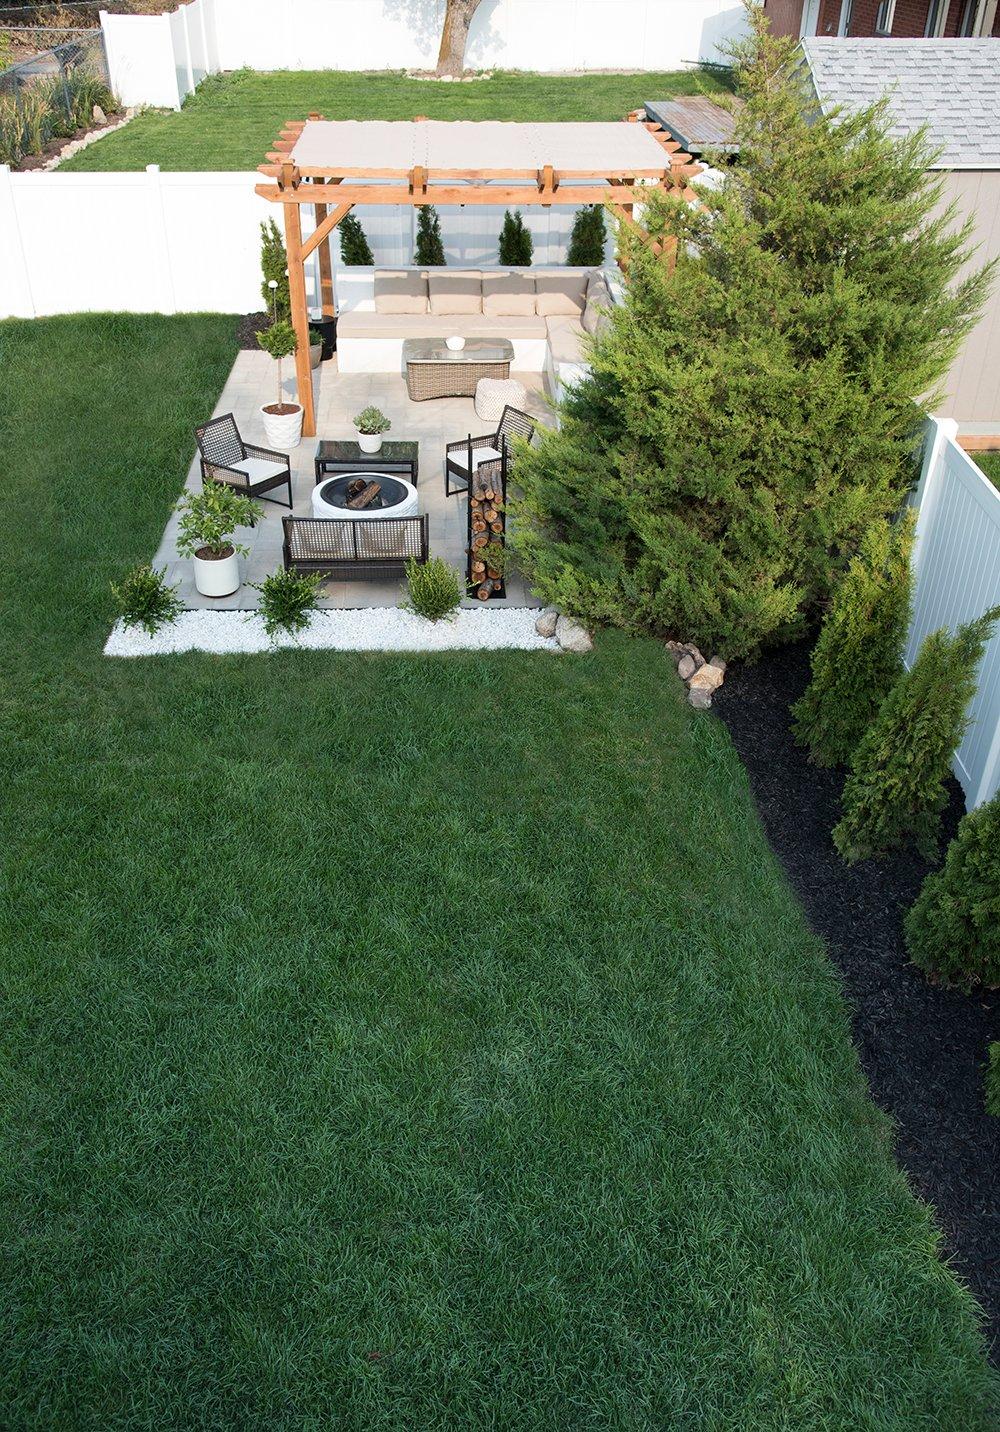 Backyard Landscaping Design - Room for Tuesday Blog